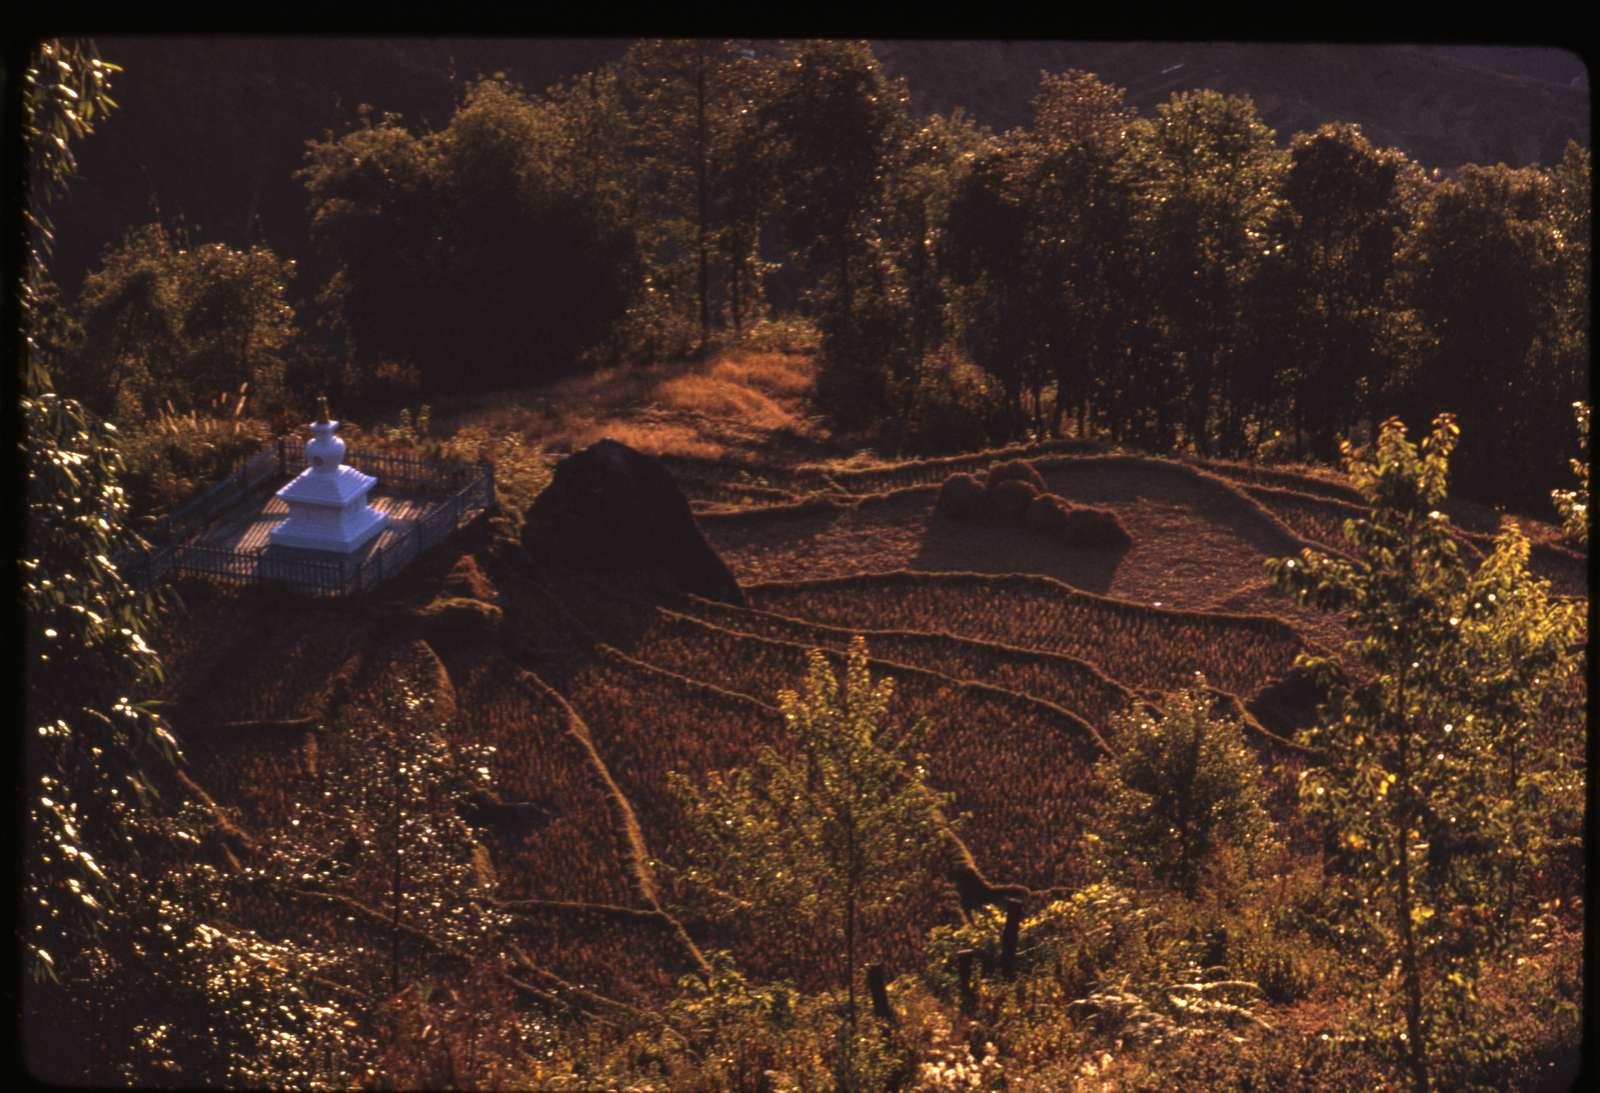 [Terraces with religious shrine?, Sikkim]